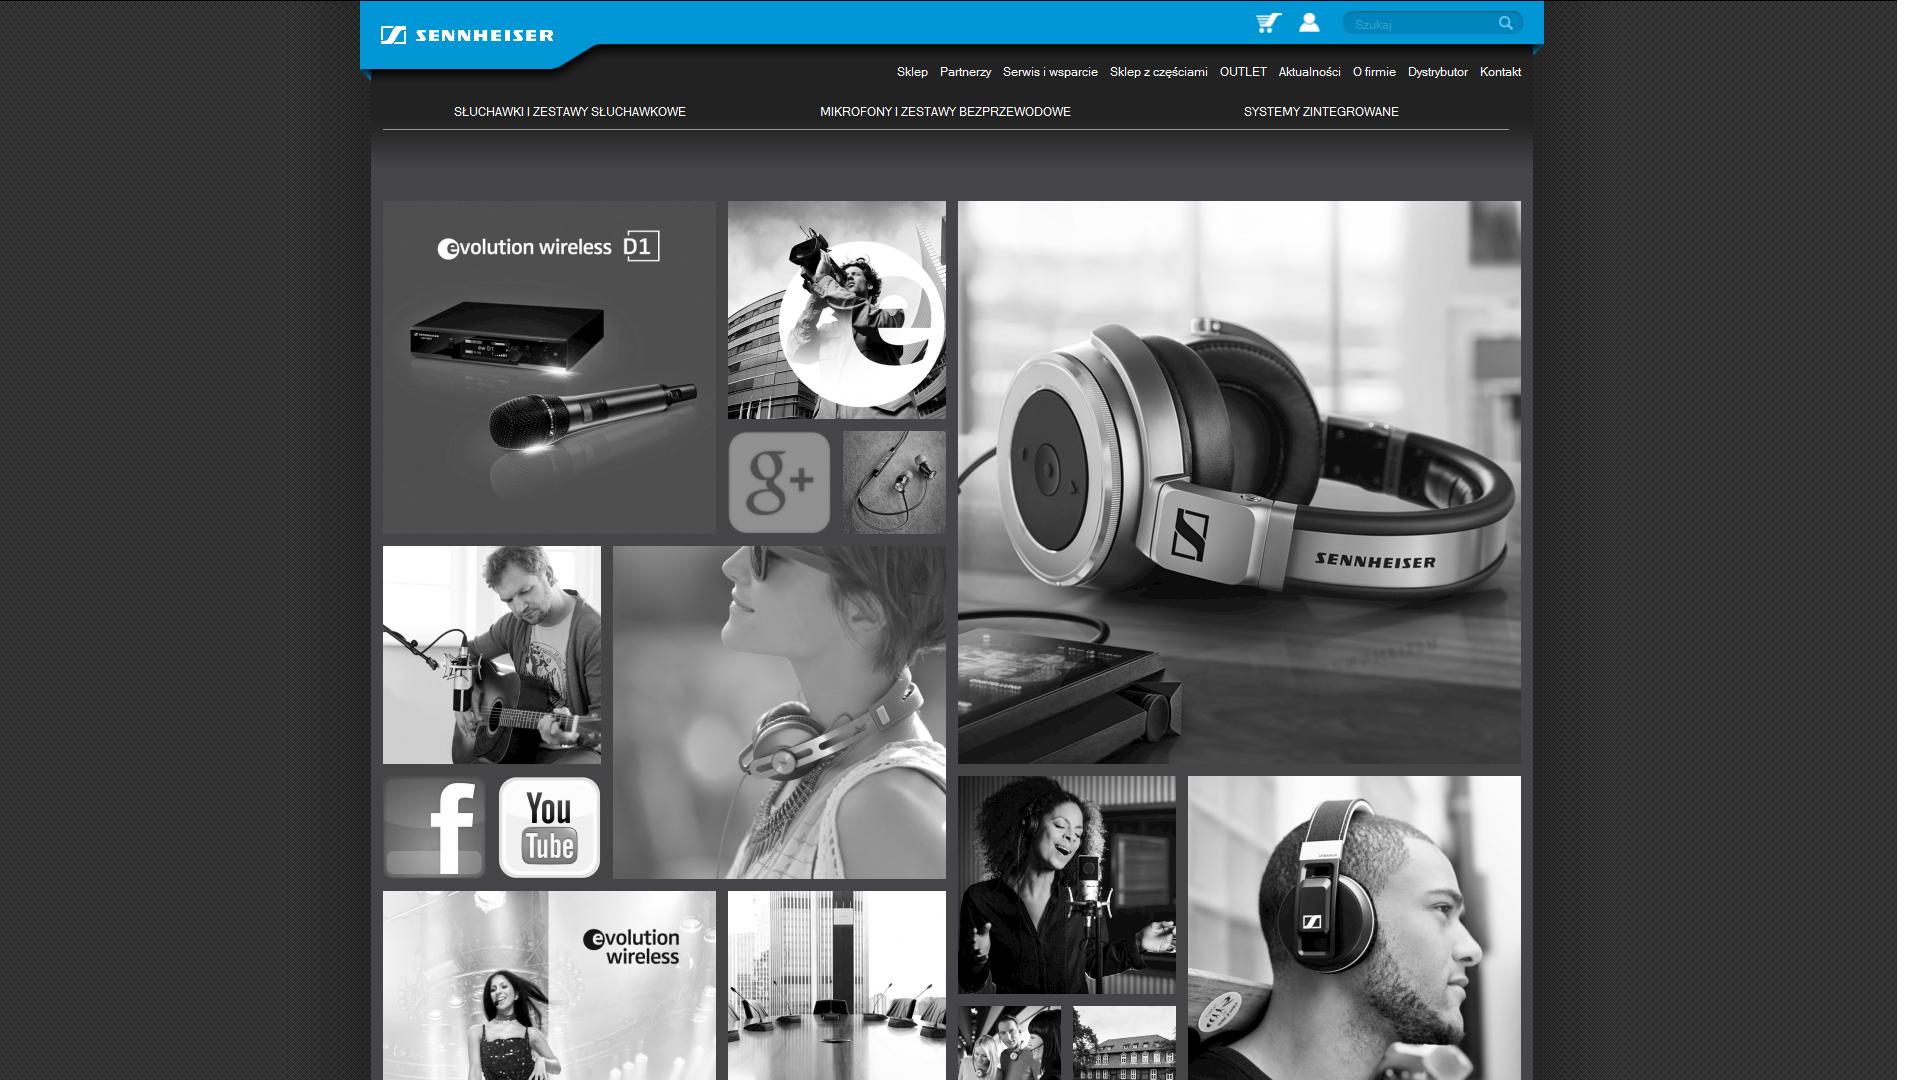 Nowa strona Sennheisera z e-sklepem